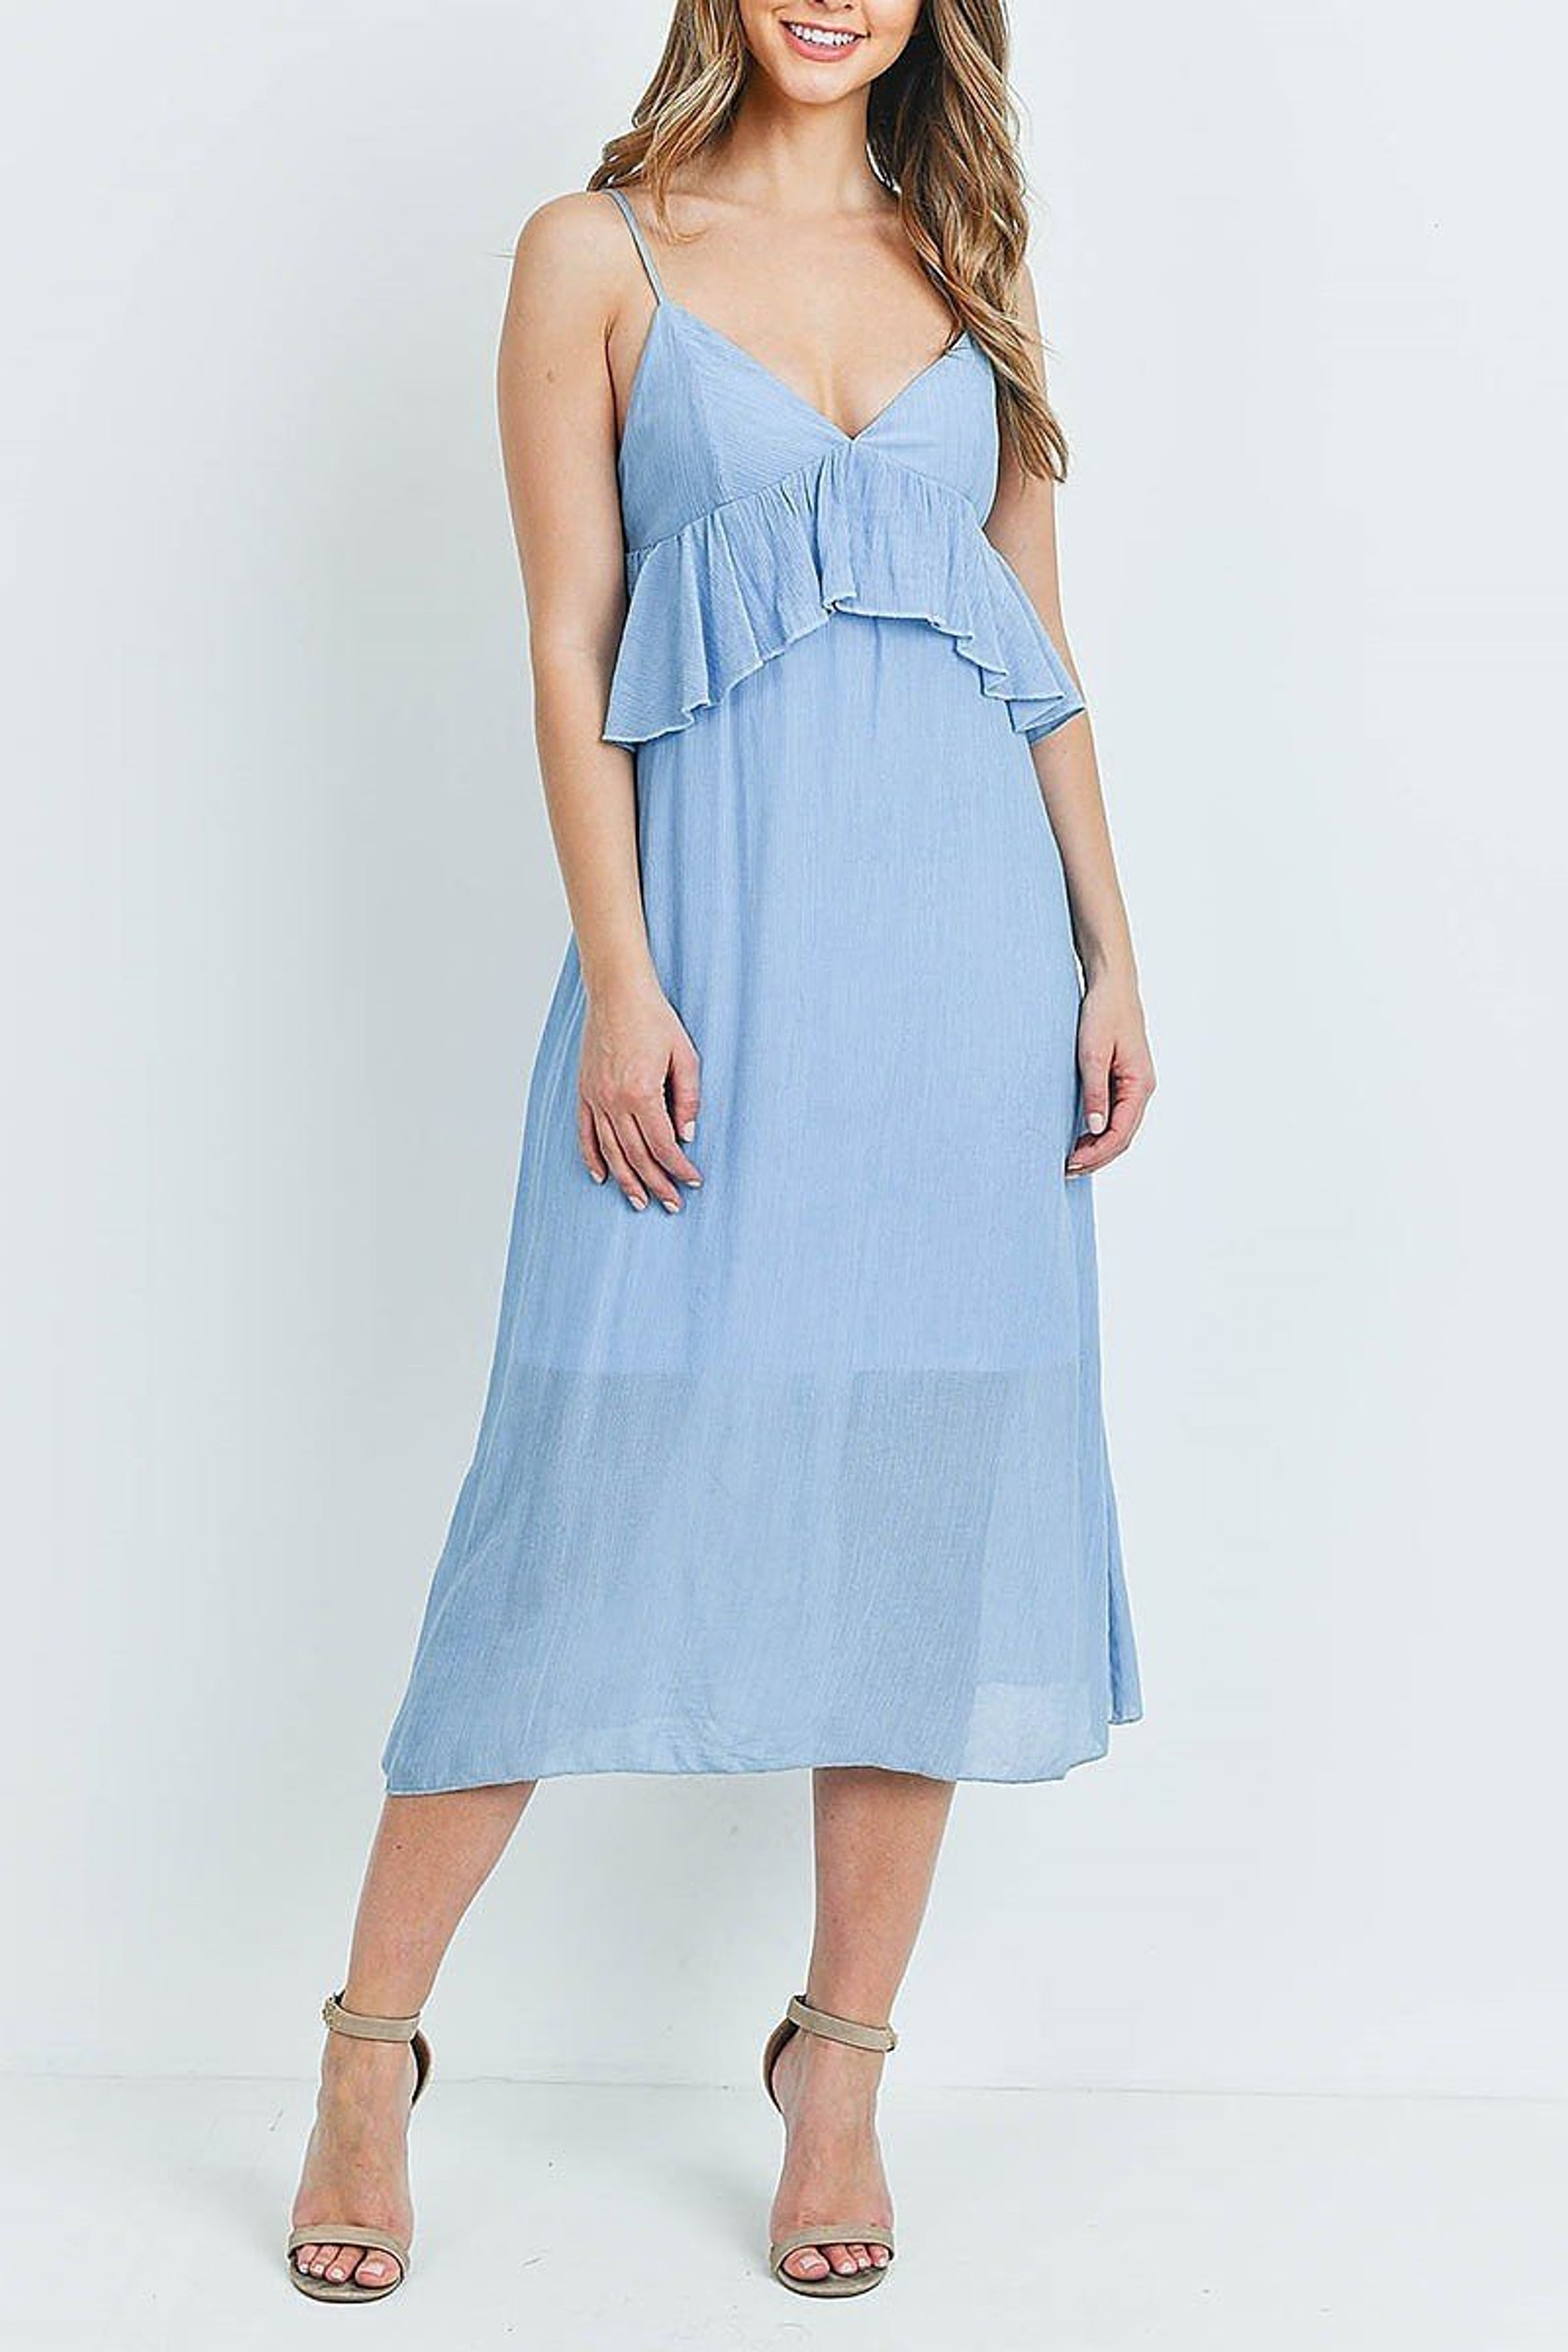 Blue Ruffle Accent V-Neck Flare Midi Dress